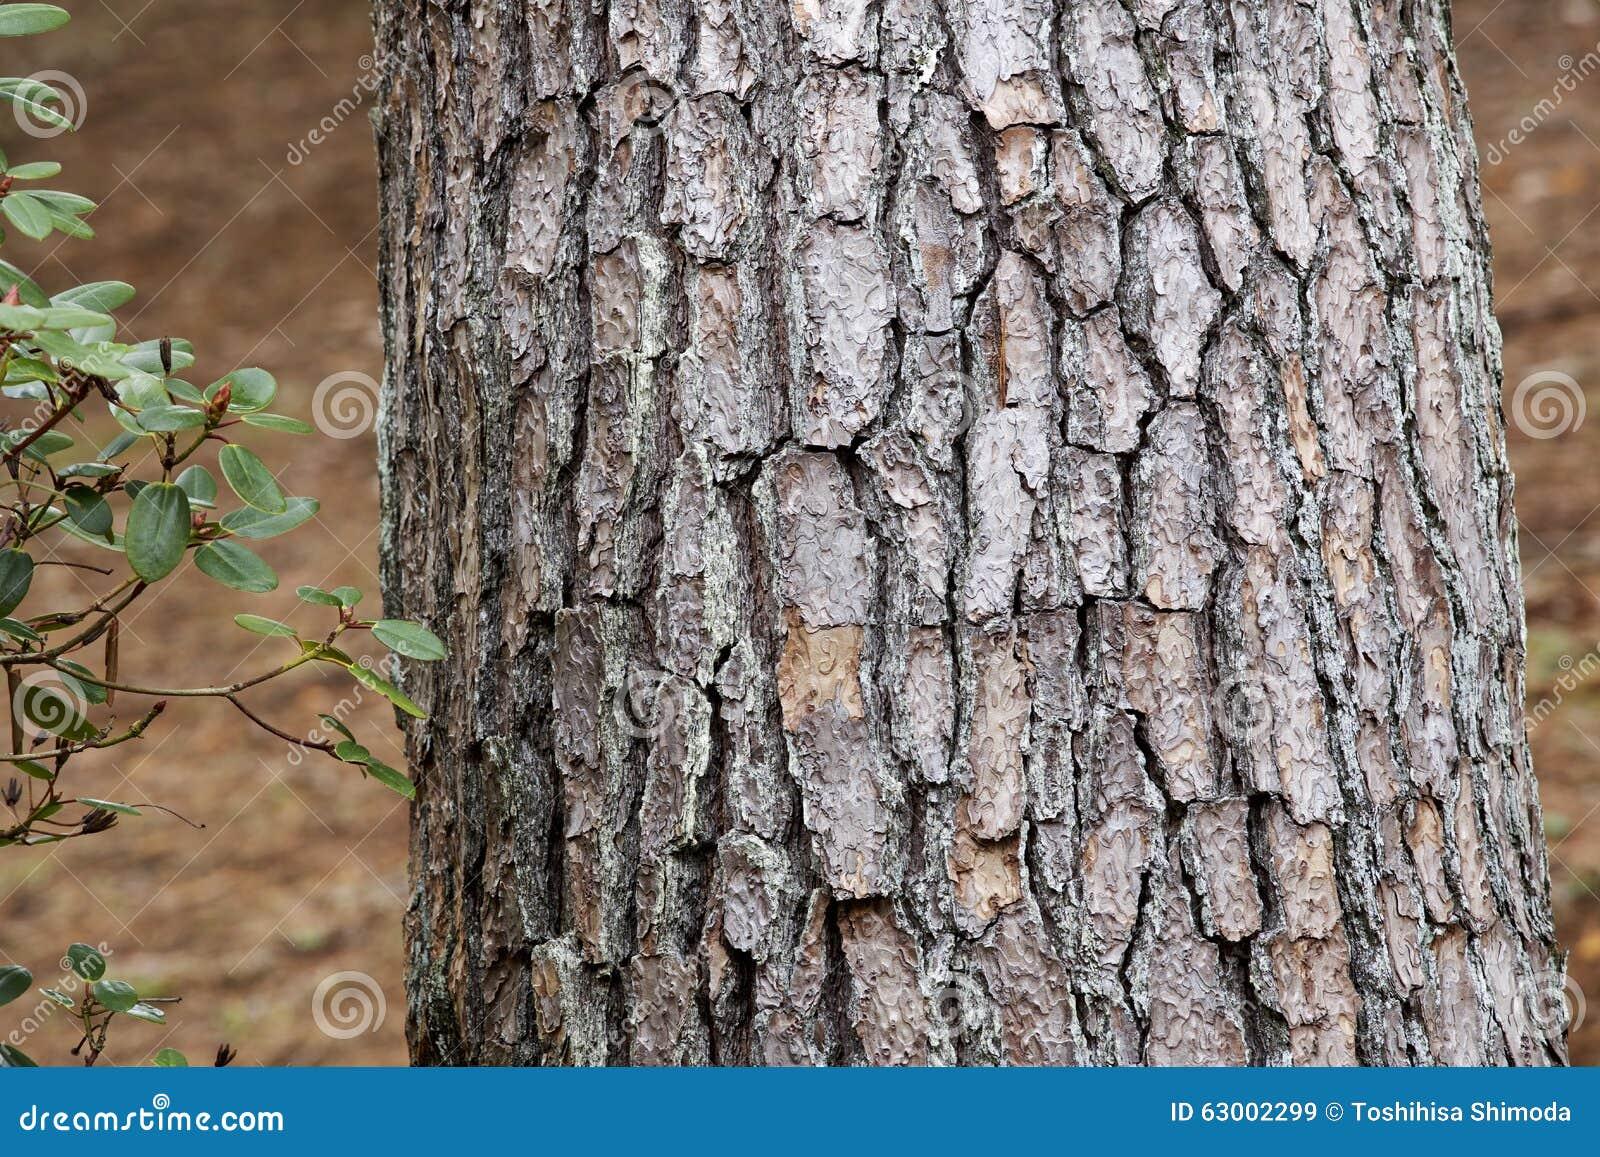 bark of red pine stock photo image 63002299. Black Bedroom Furniture Sets. Home Design Ideas